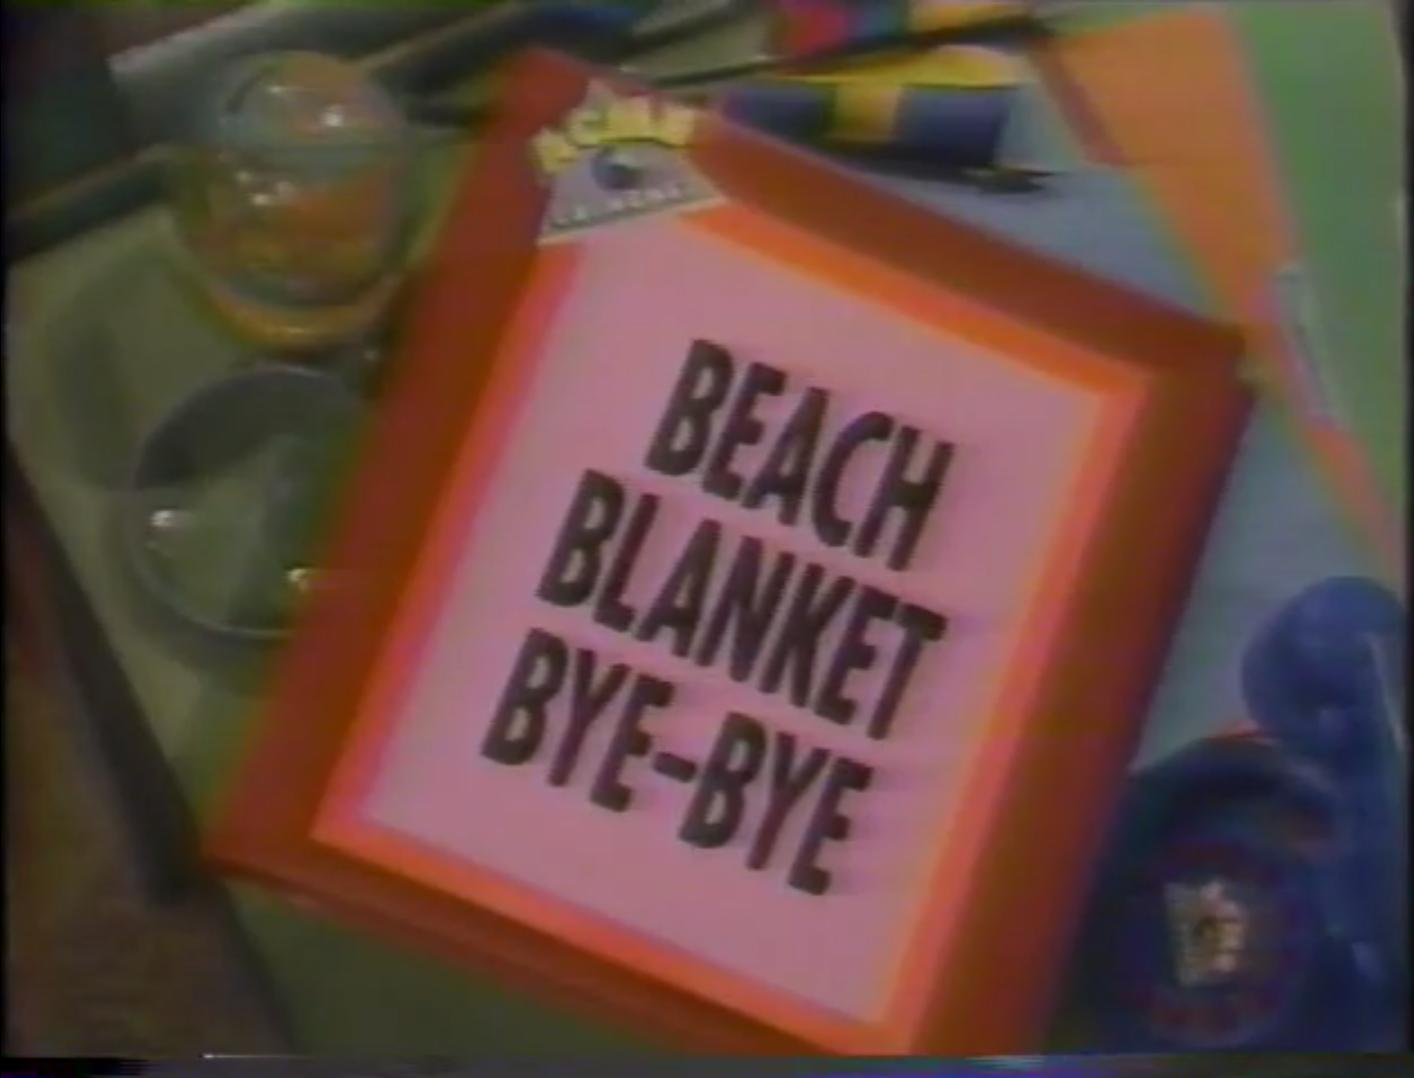 Beach Blanket Bye-Bye